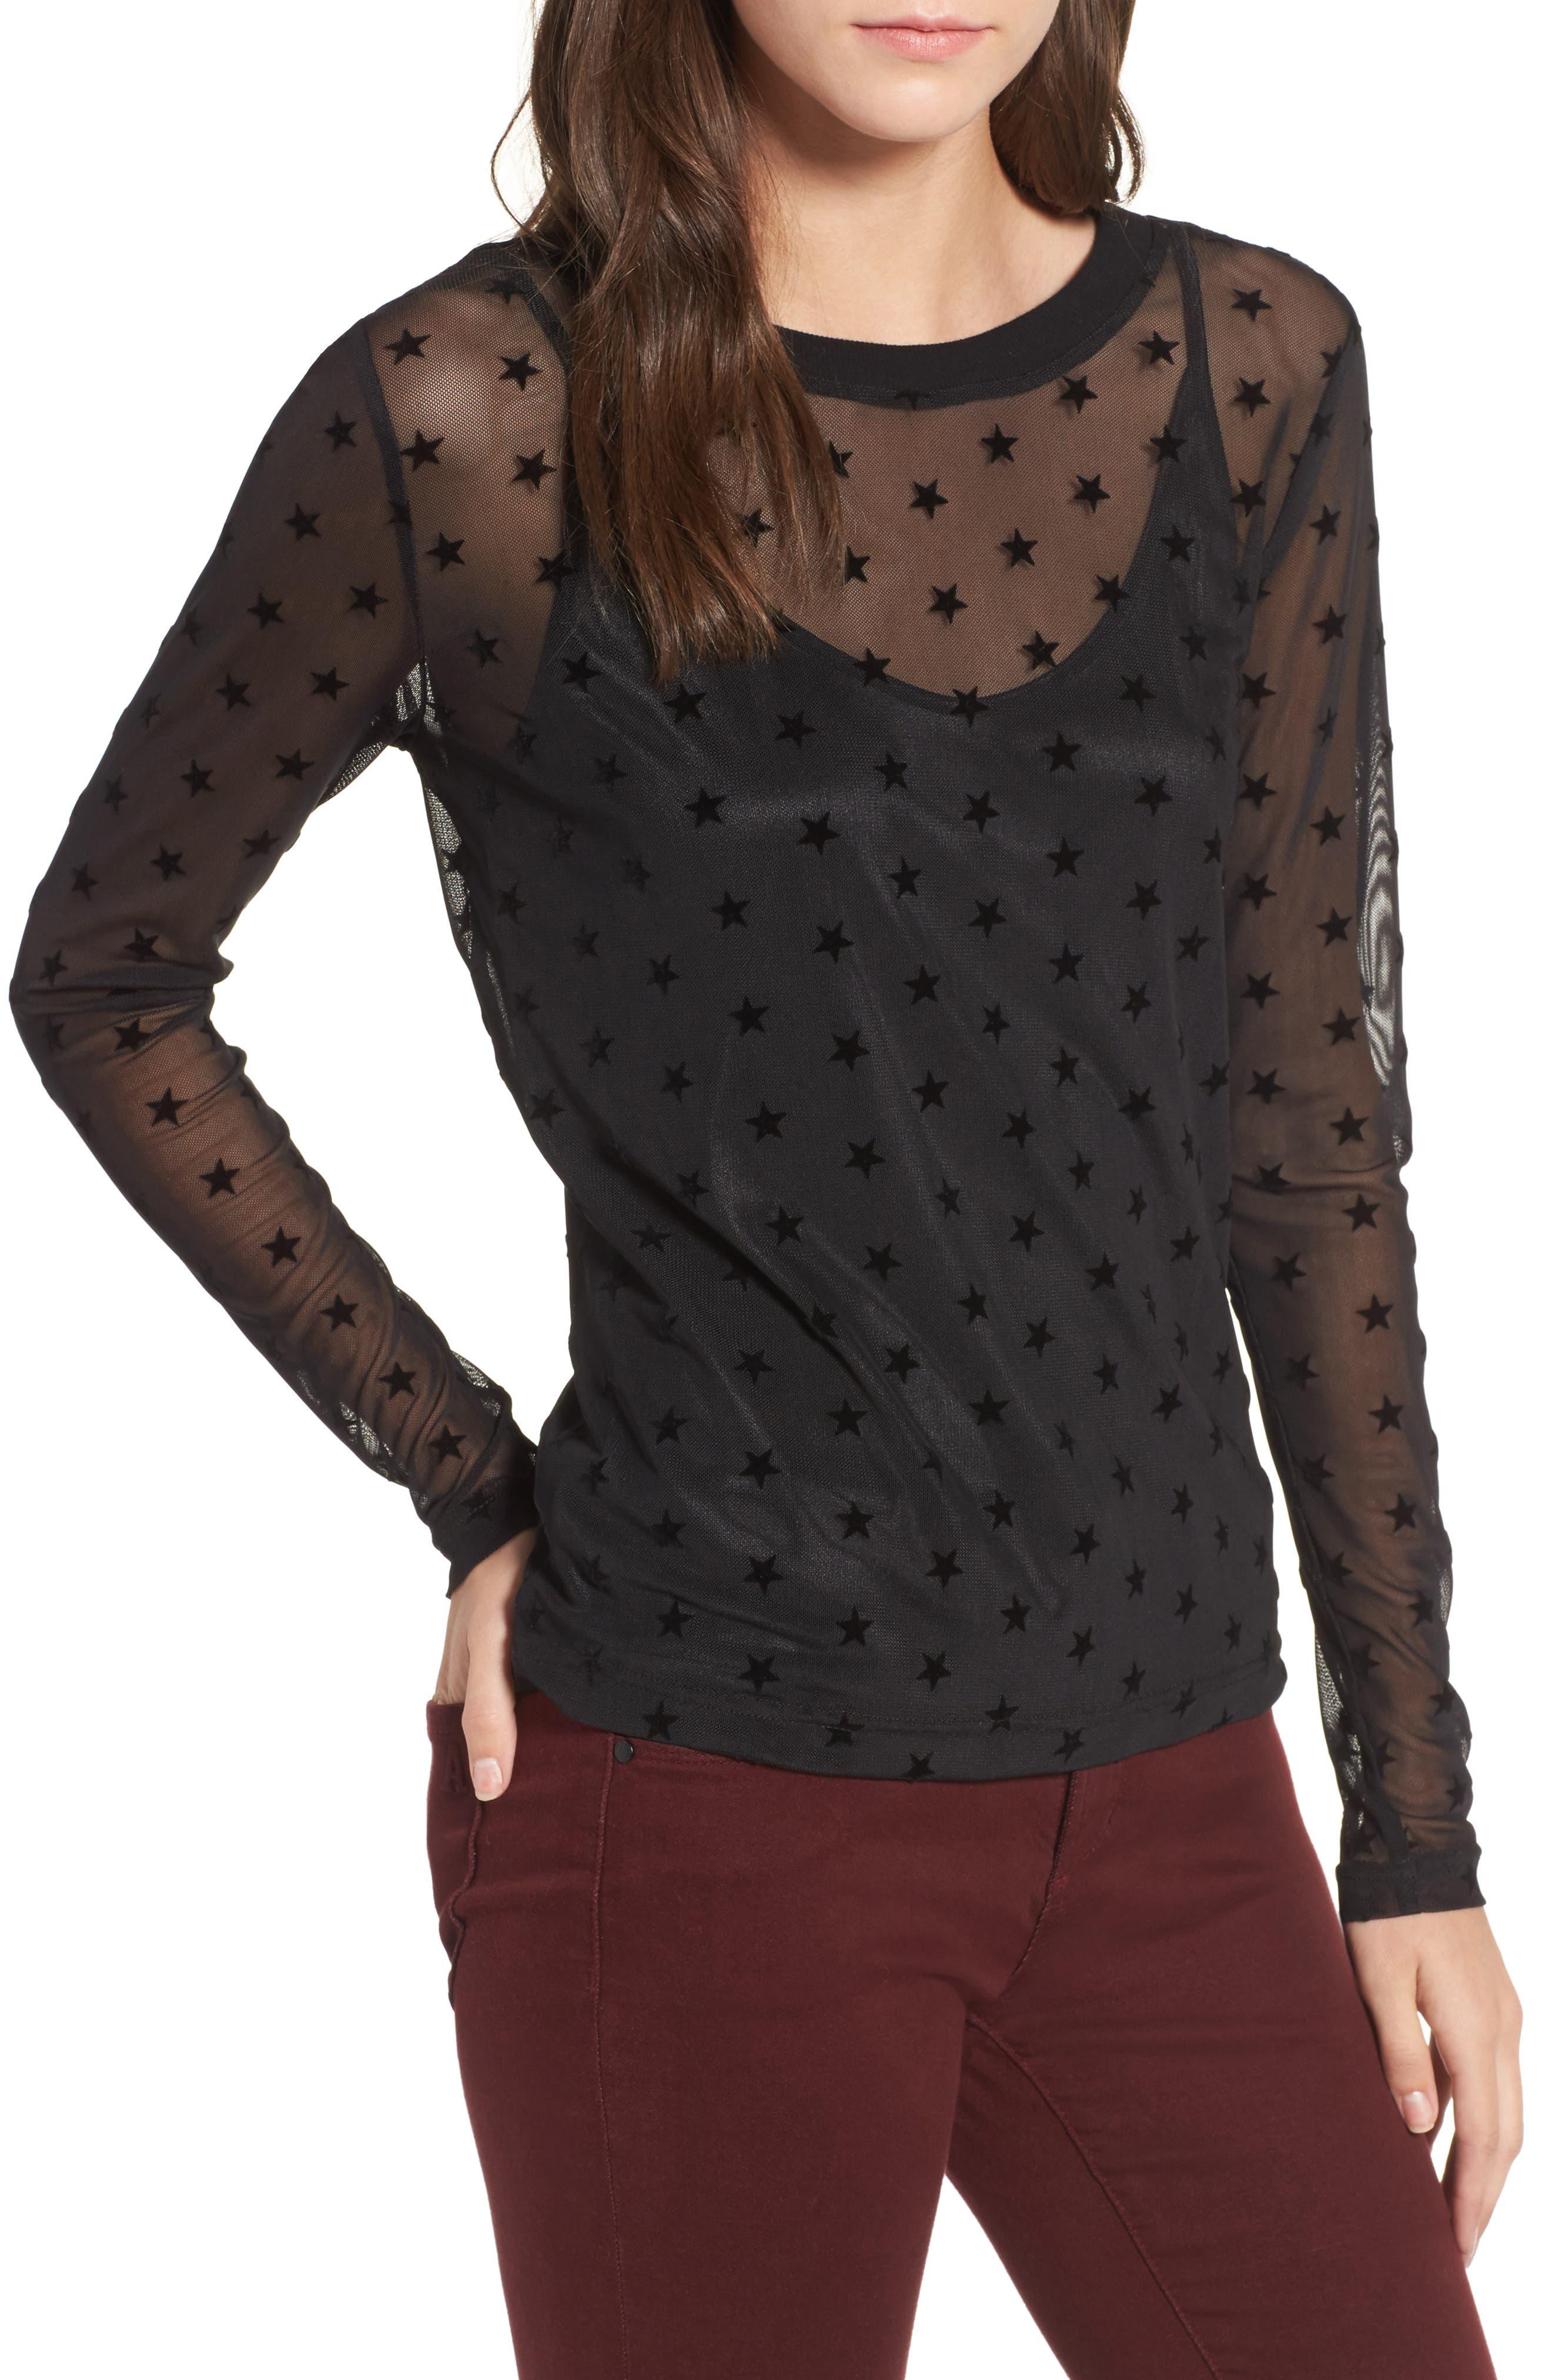 Alternate Image 1 Selected - Elodie Star Mesh Top